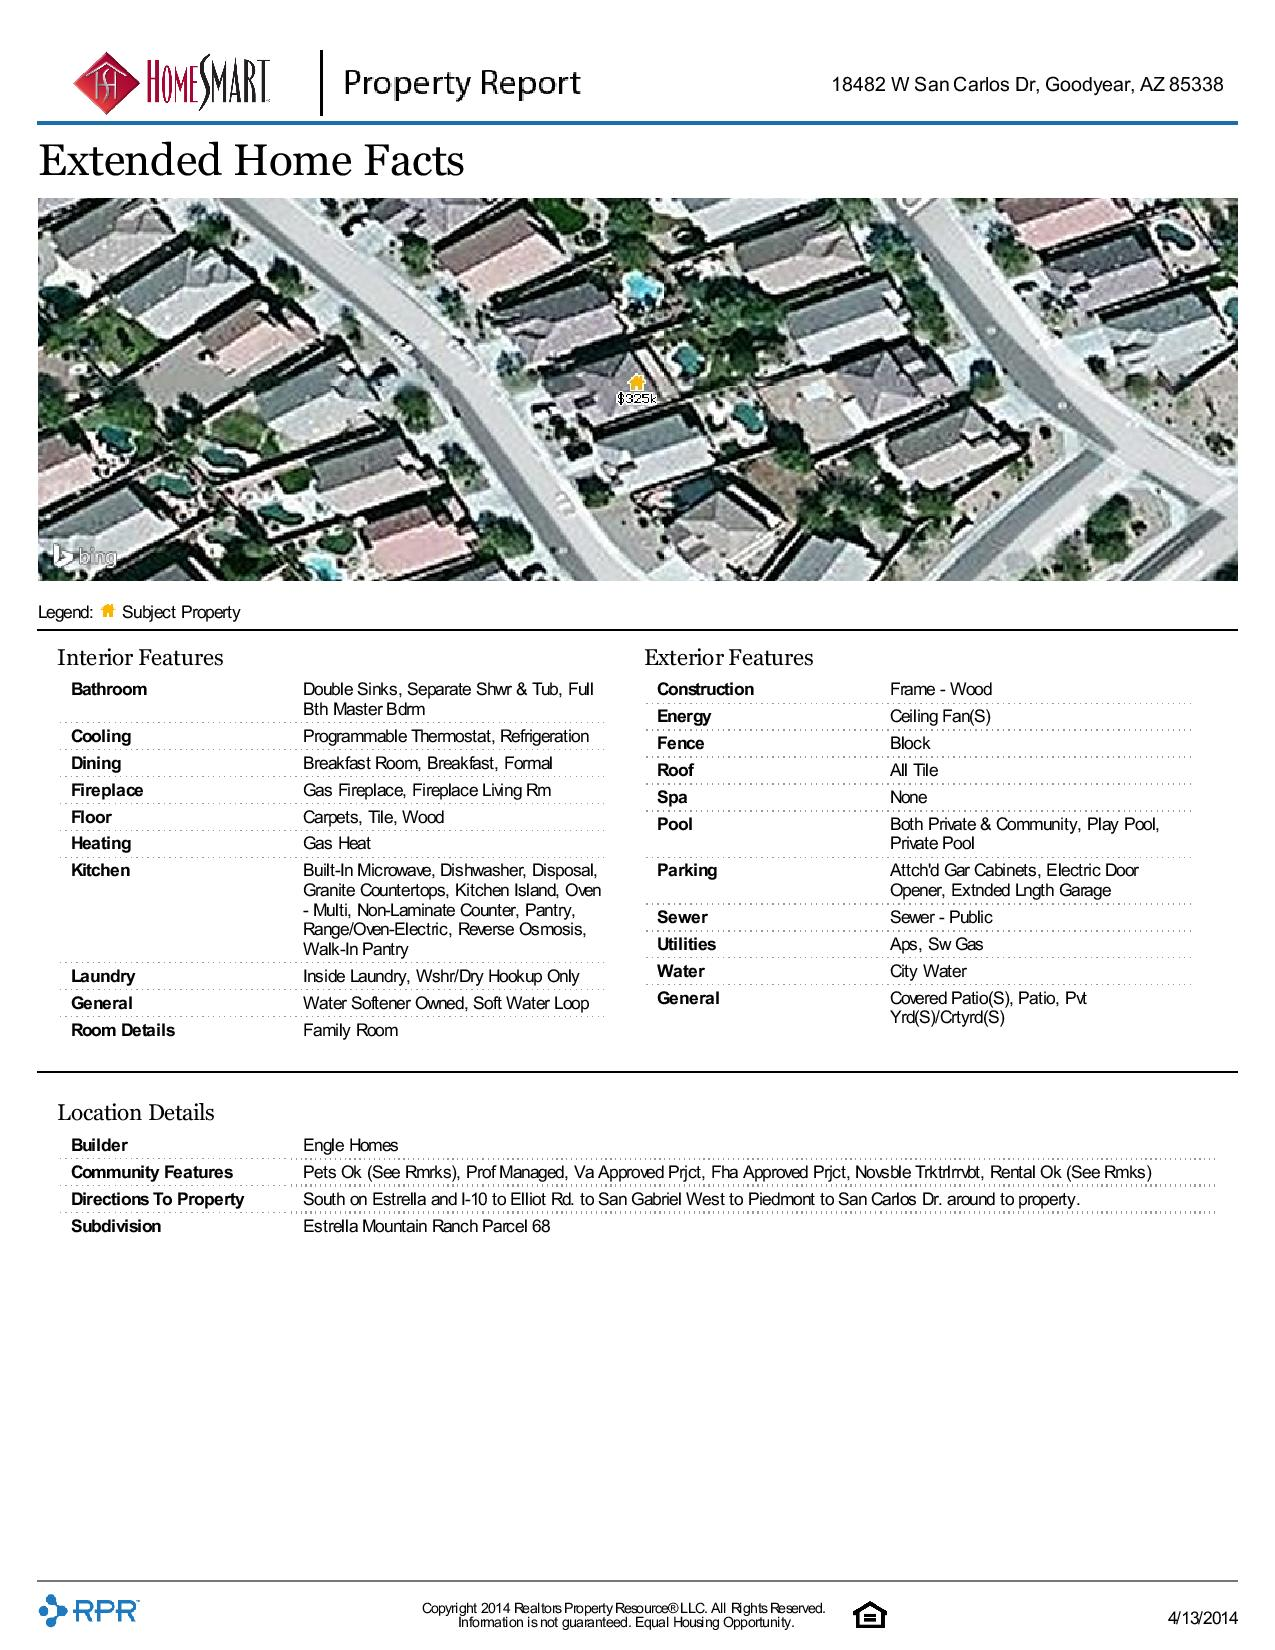 18482-W-San-Carlos-Dr-Goodyear-AZ-85338-page-004